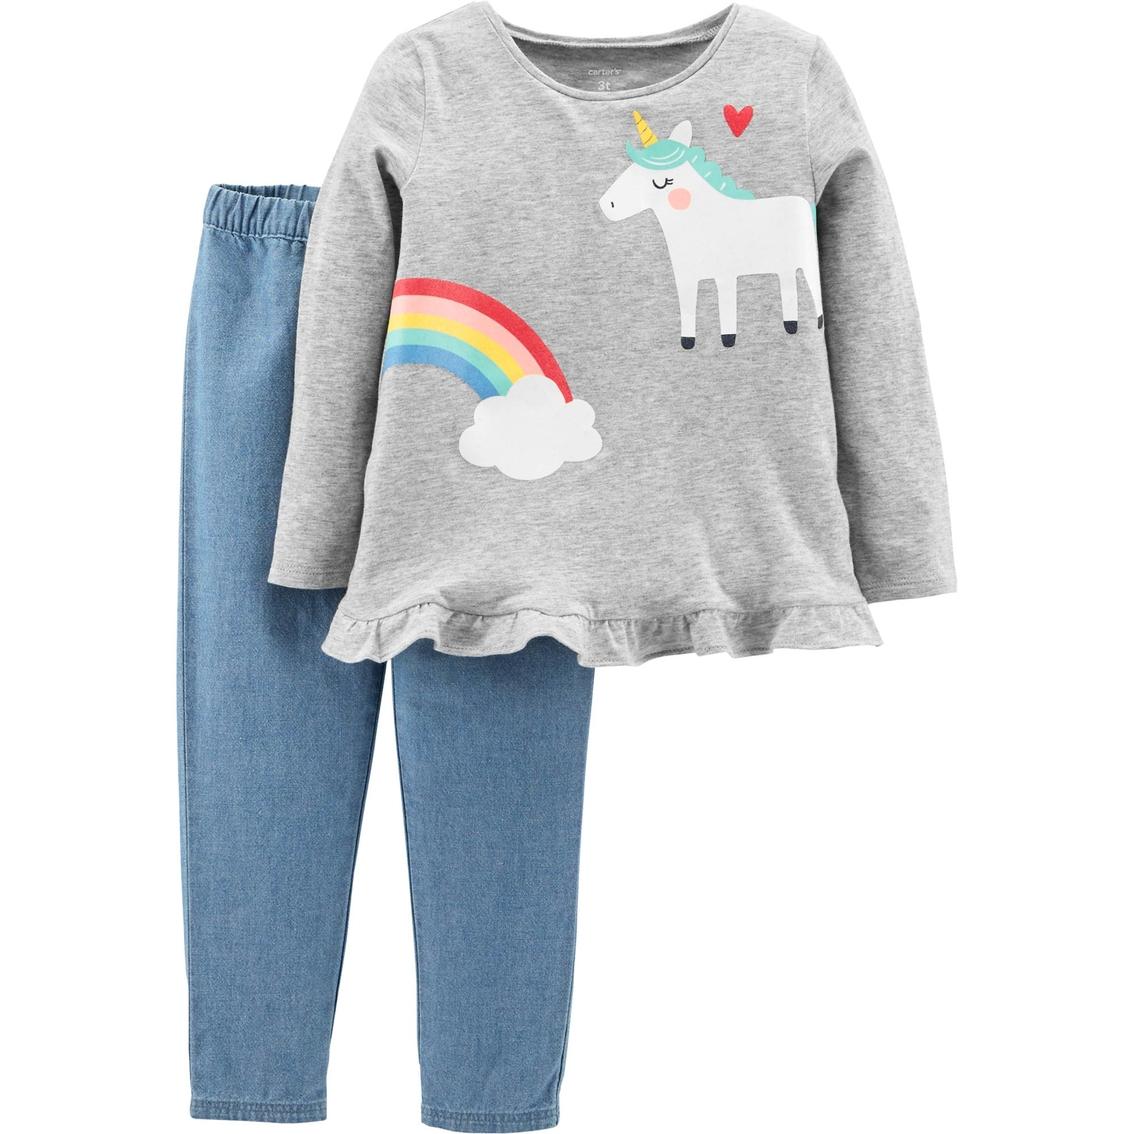 a8cfc253 Carter's Toddler Girls 2 Pc. Unicorn And Chambray Pants Set ...